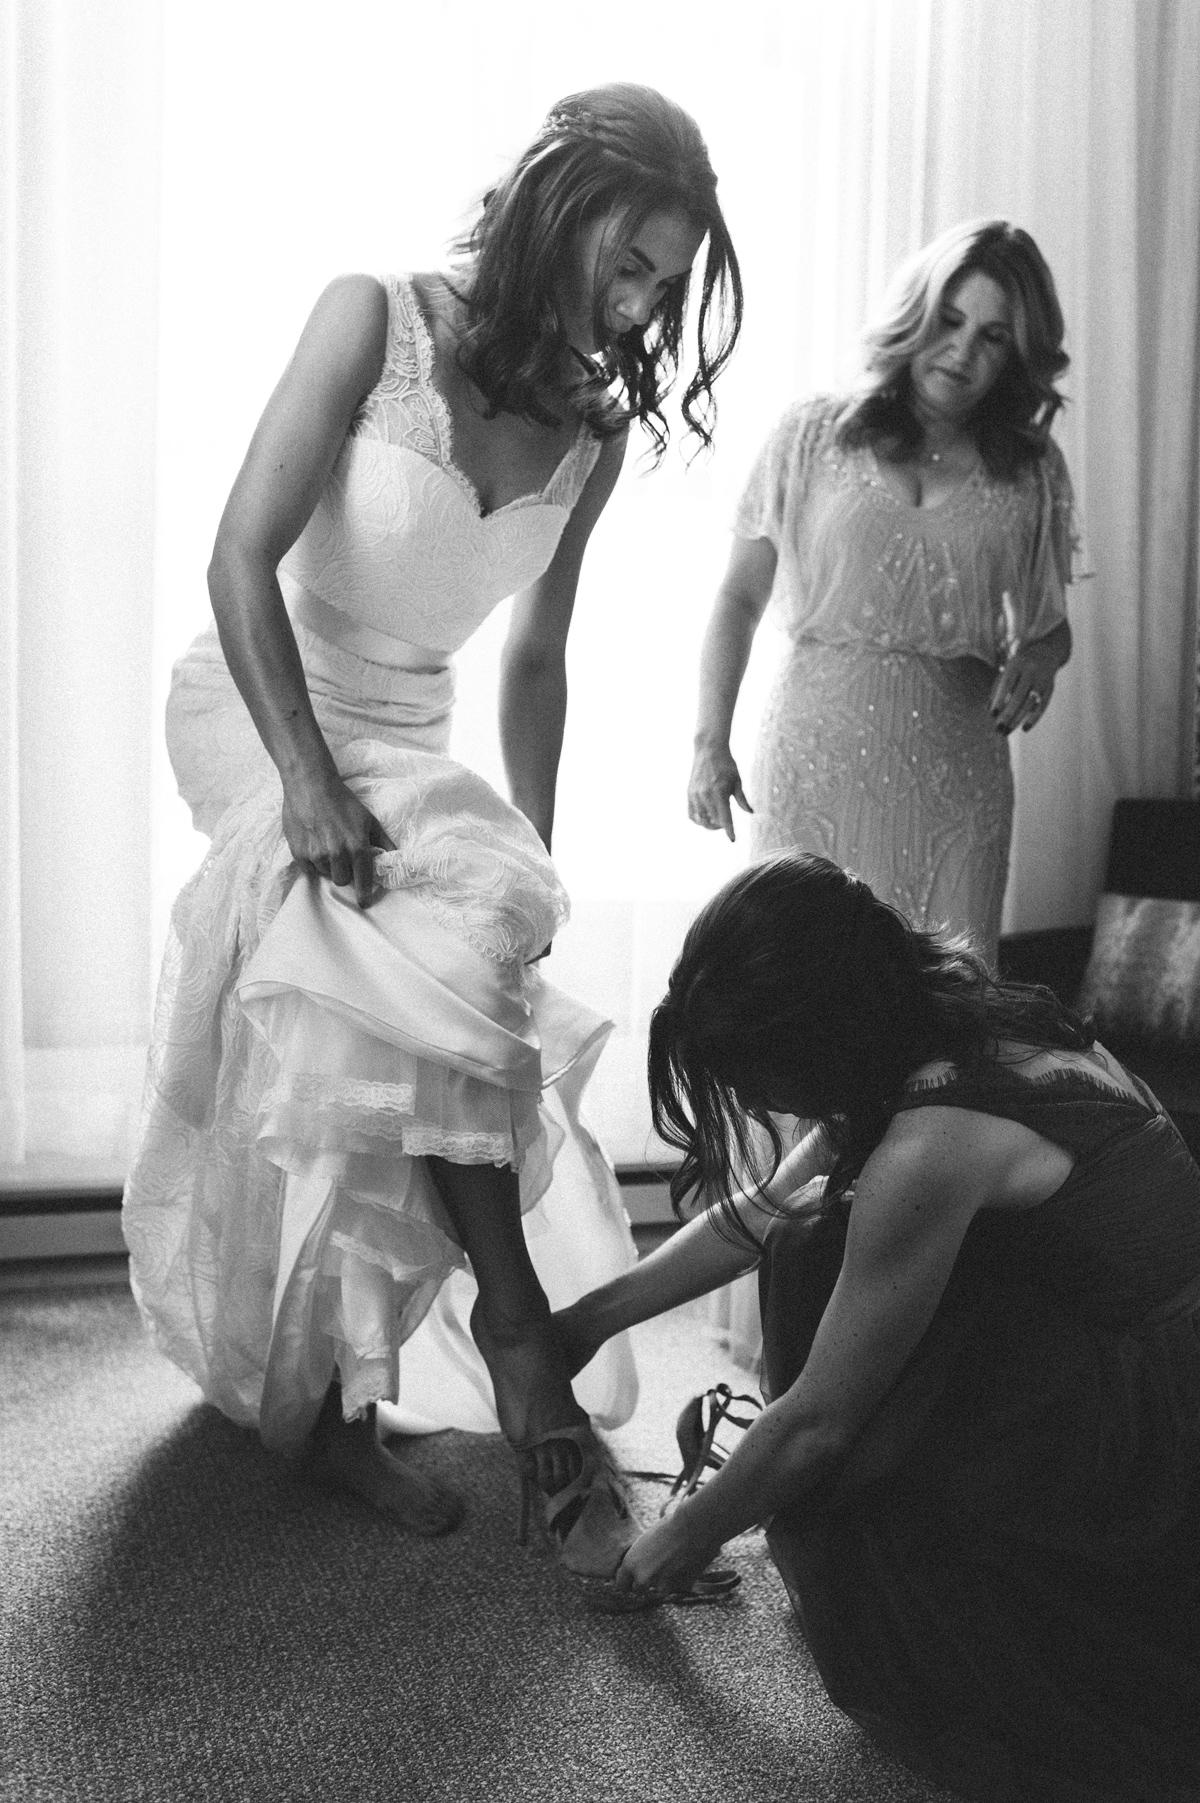 065-beaver-creek--park-hyatt--bride--wedding-photo--dress--bridesmaid--black-and-white.jpg